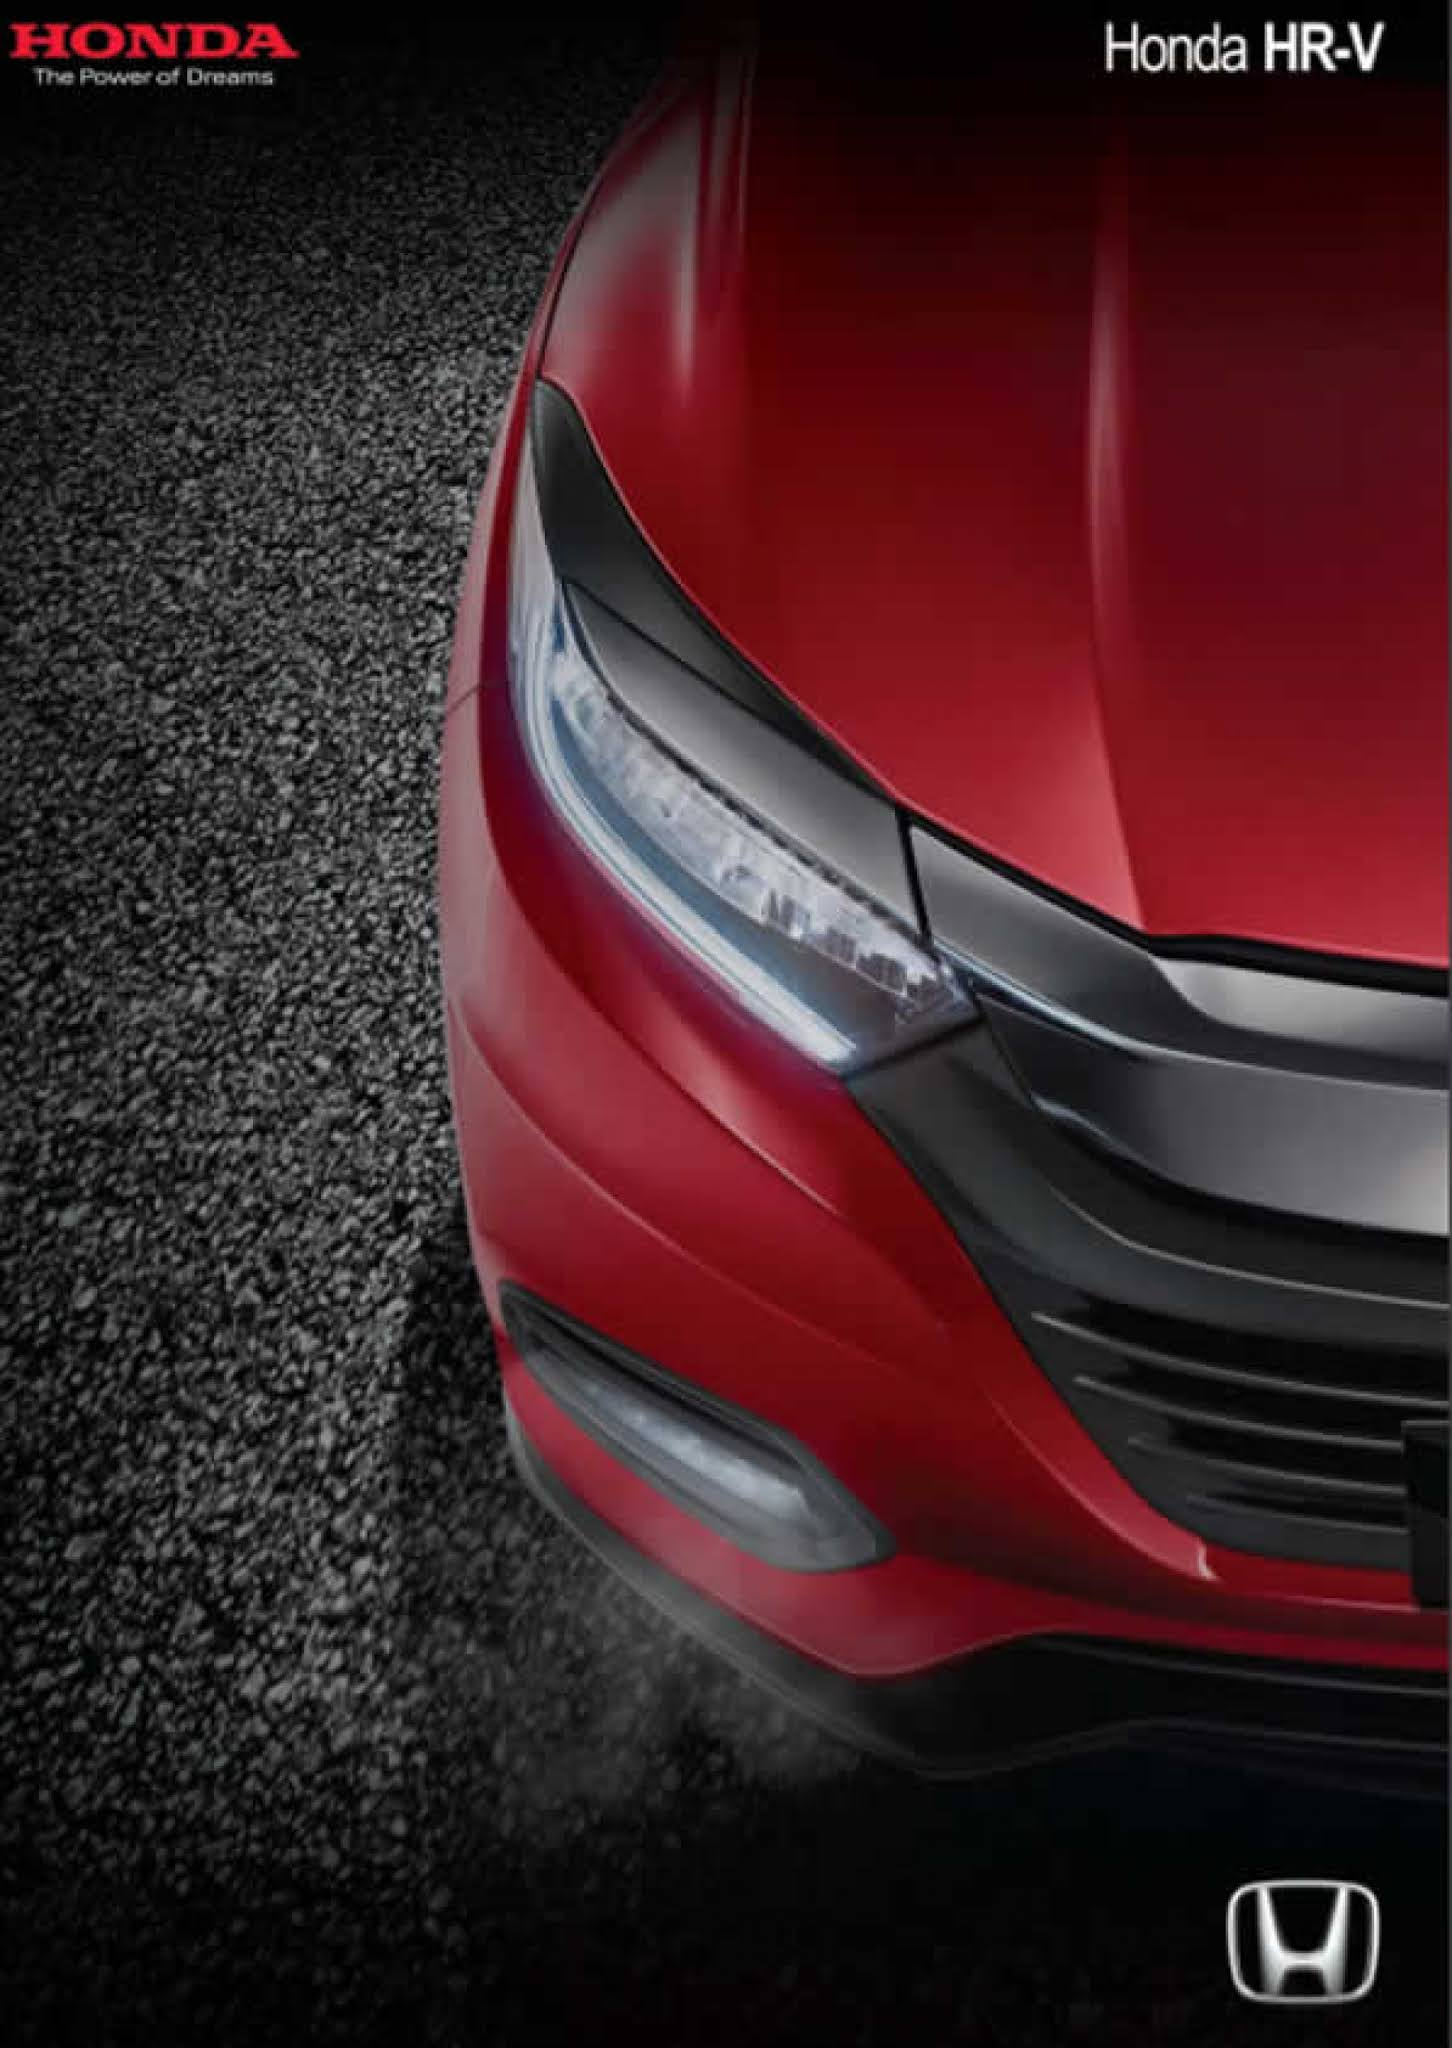 Harga Honda HRV Pekanbaru Riau Terbaru Bulan ini 2021